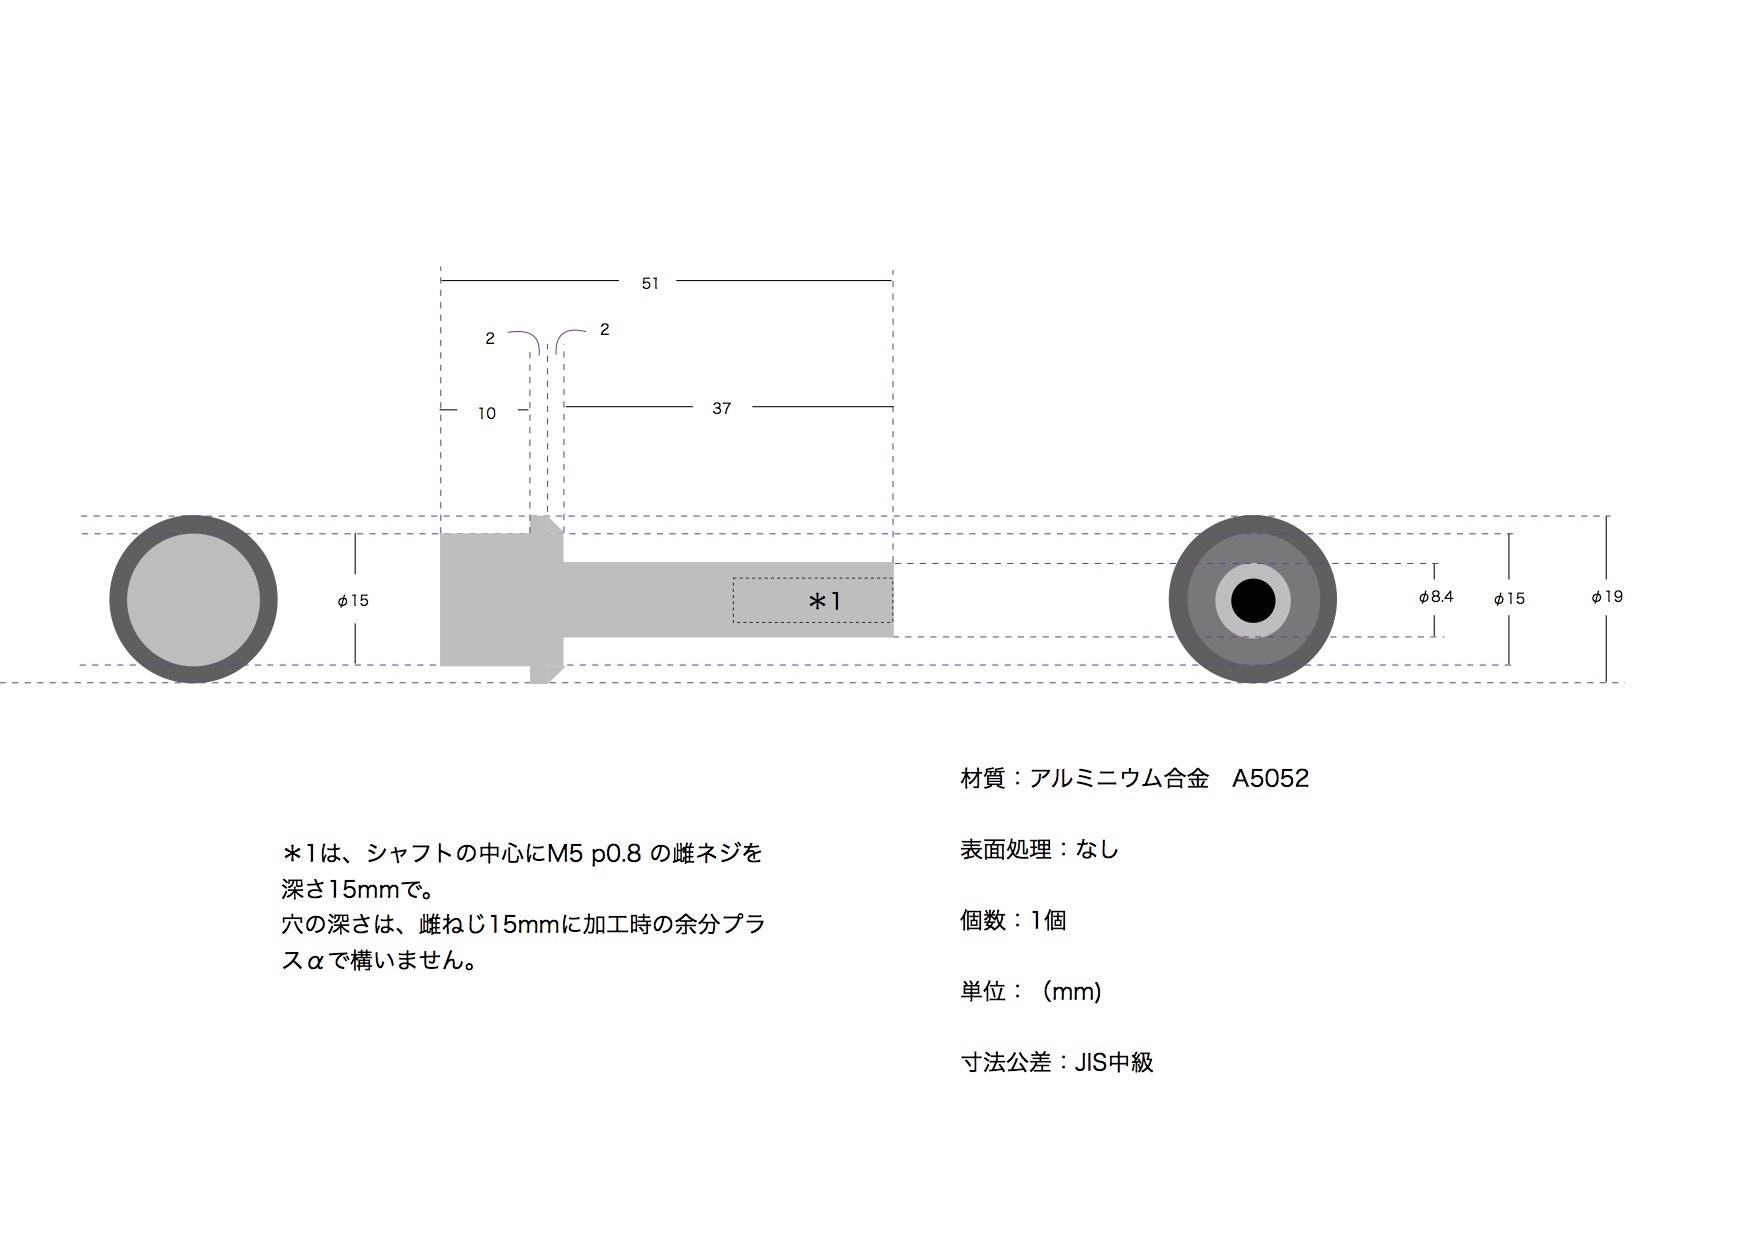 【DB7】チェンジペダル加工依頼寸法図_e0159646_05123584.jpg